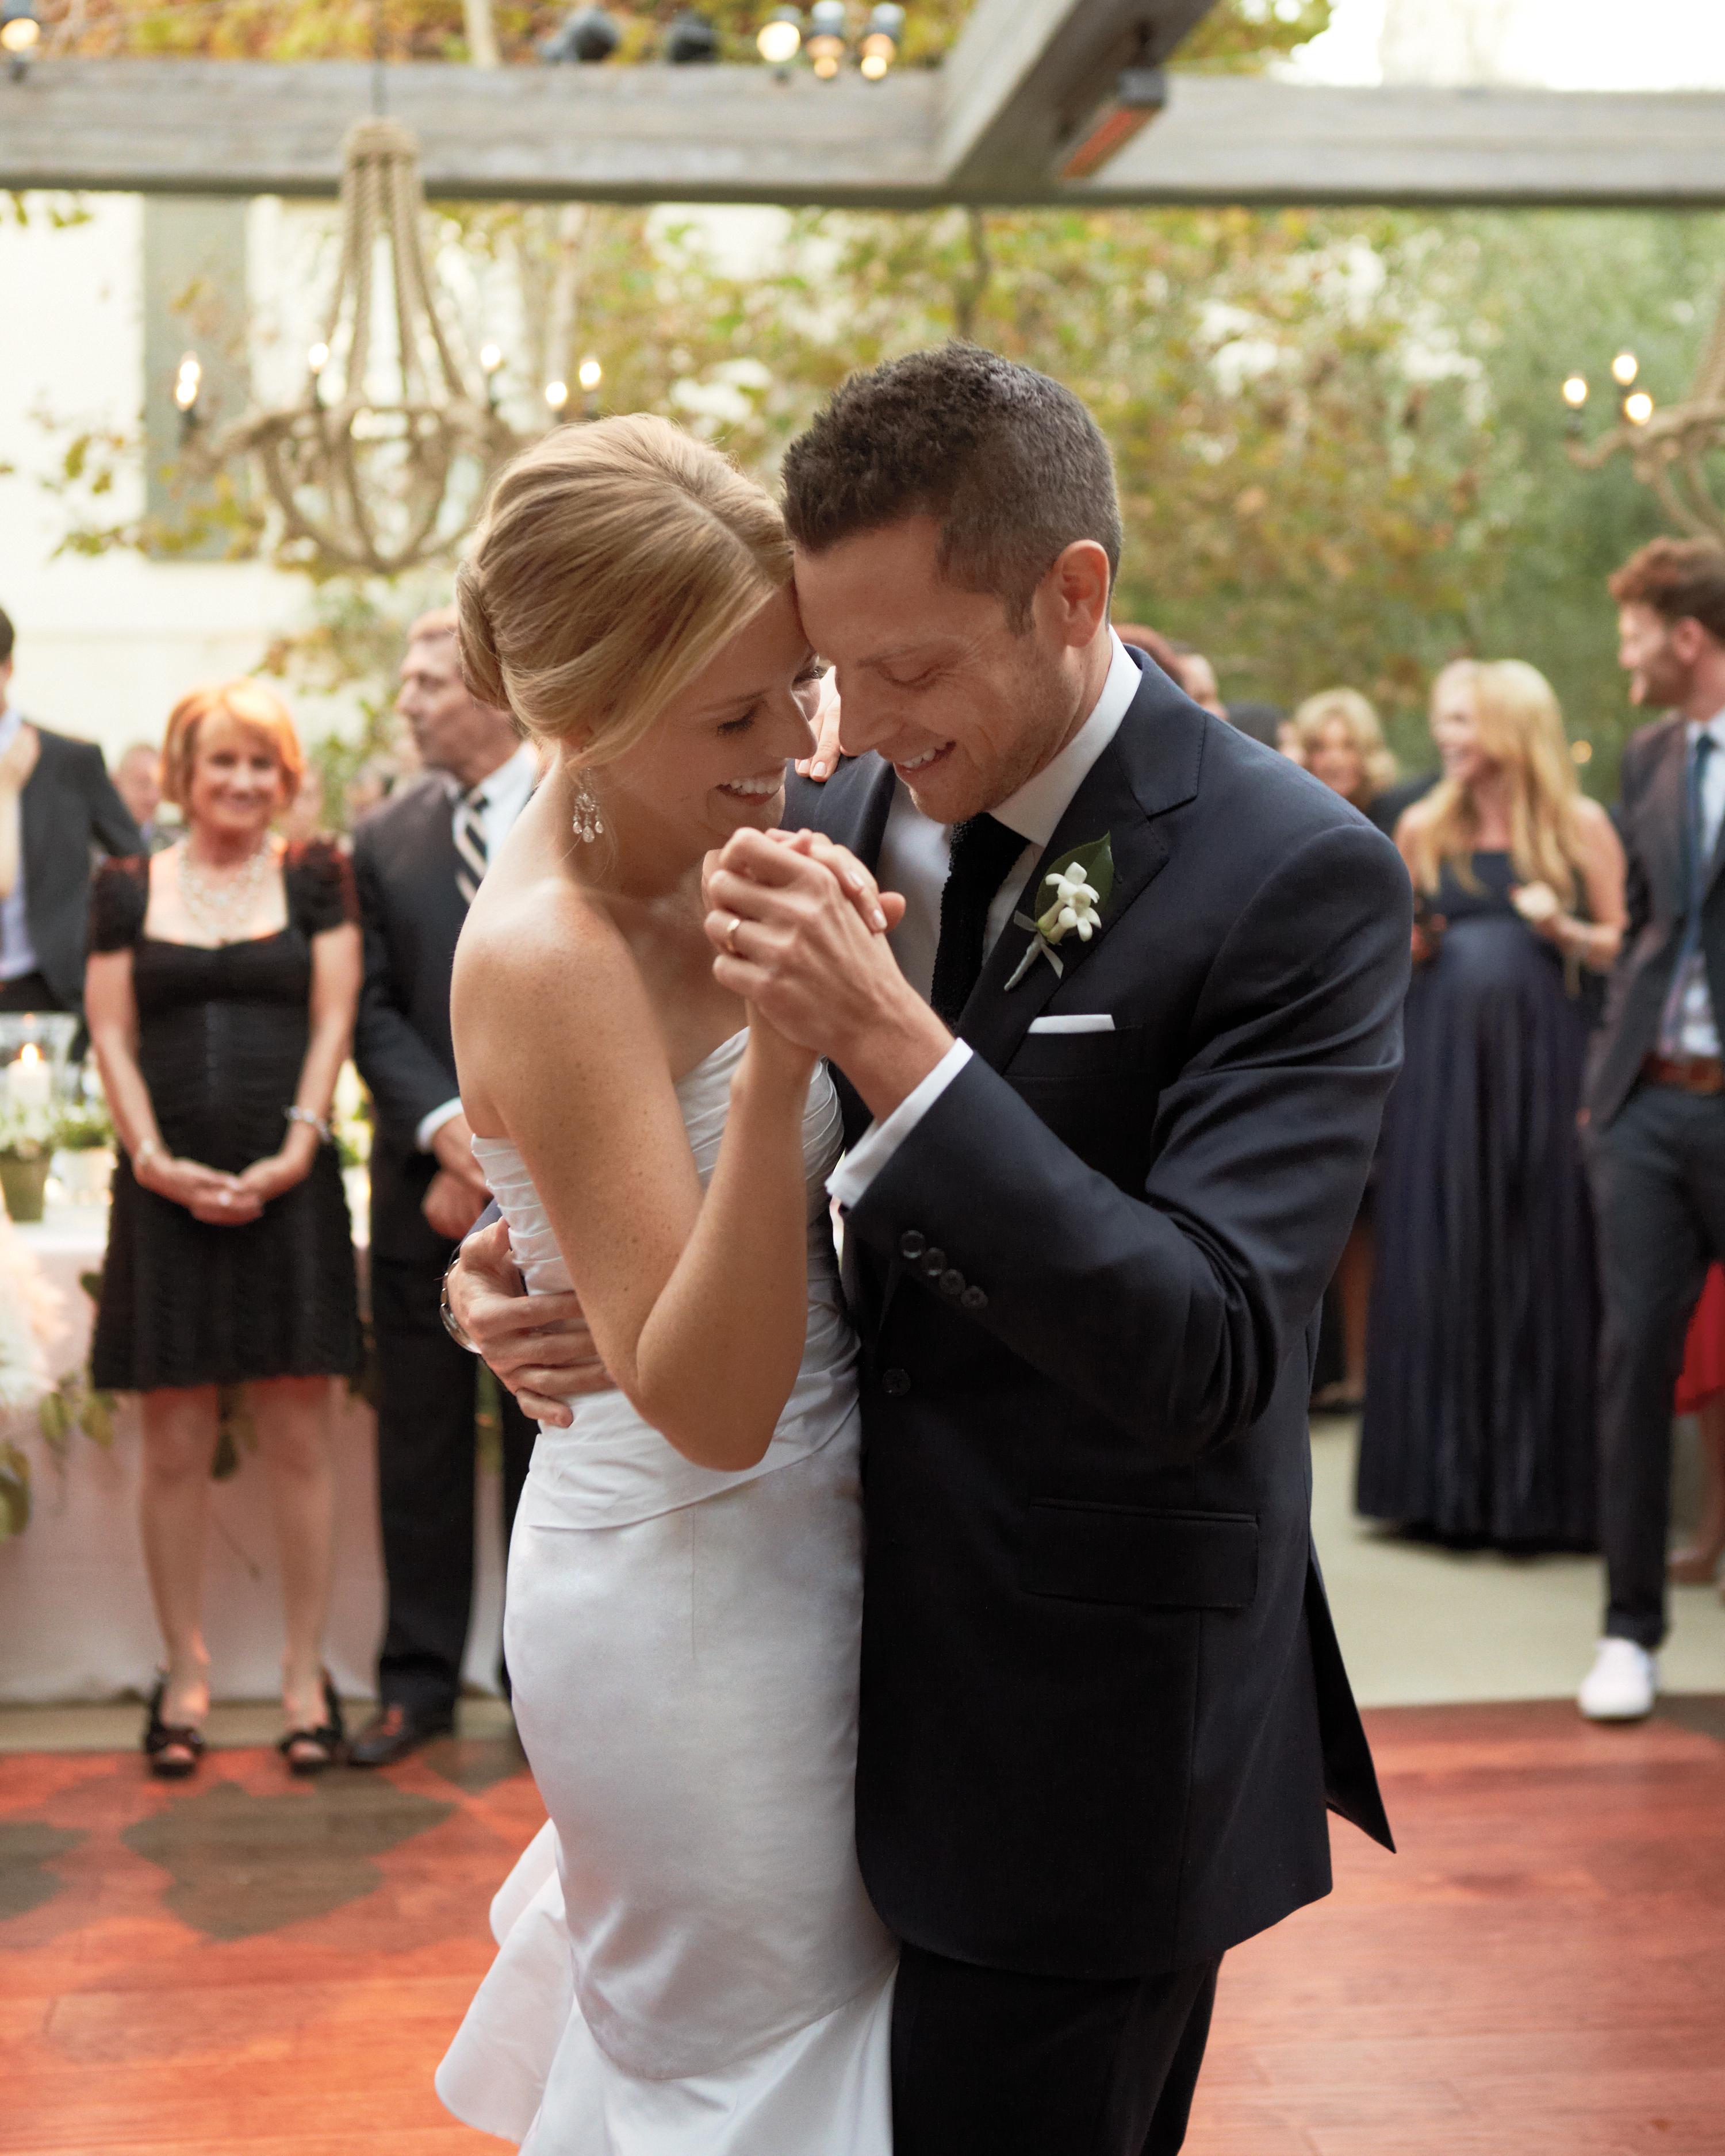 wedding-cover-bands-nova-0814.jpg